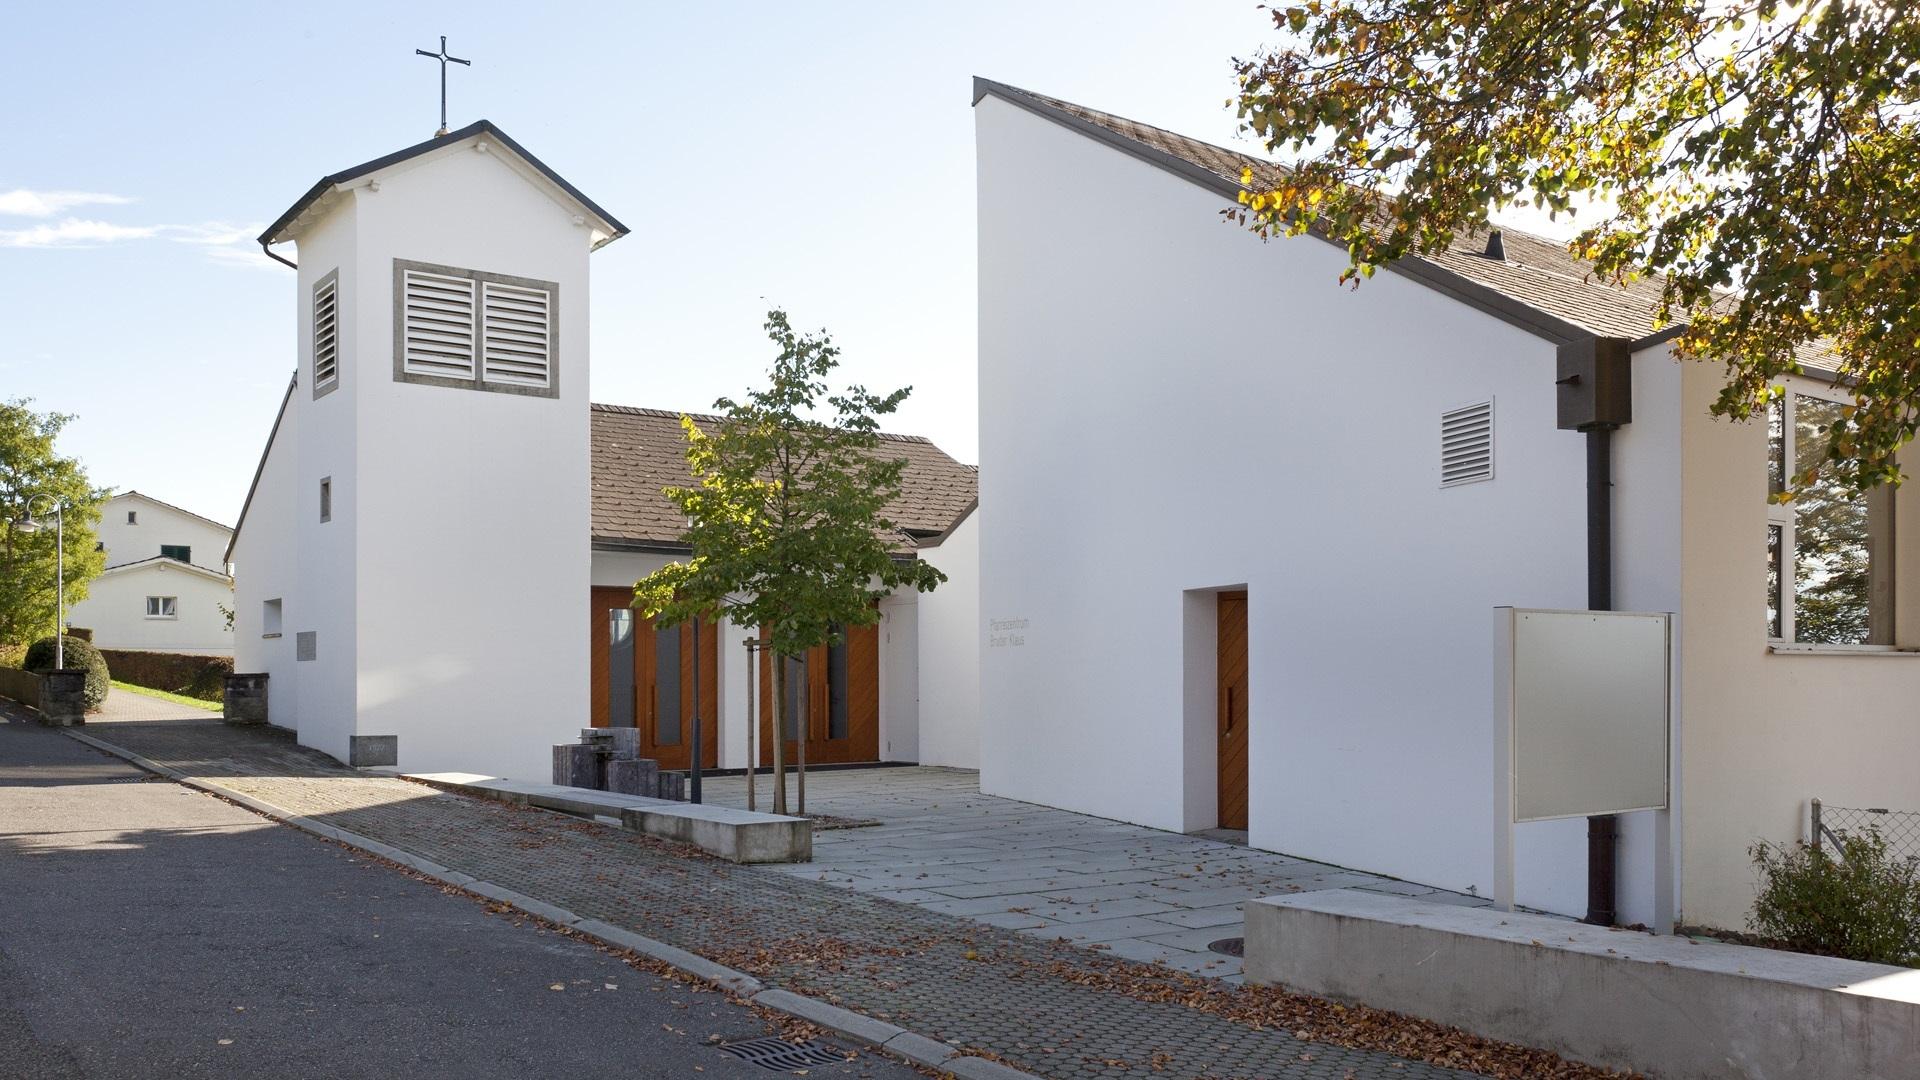 Eggenwil-Widen, St. Laurenzius | © Roger Wehrli